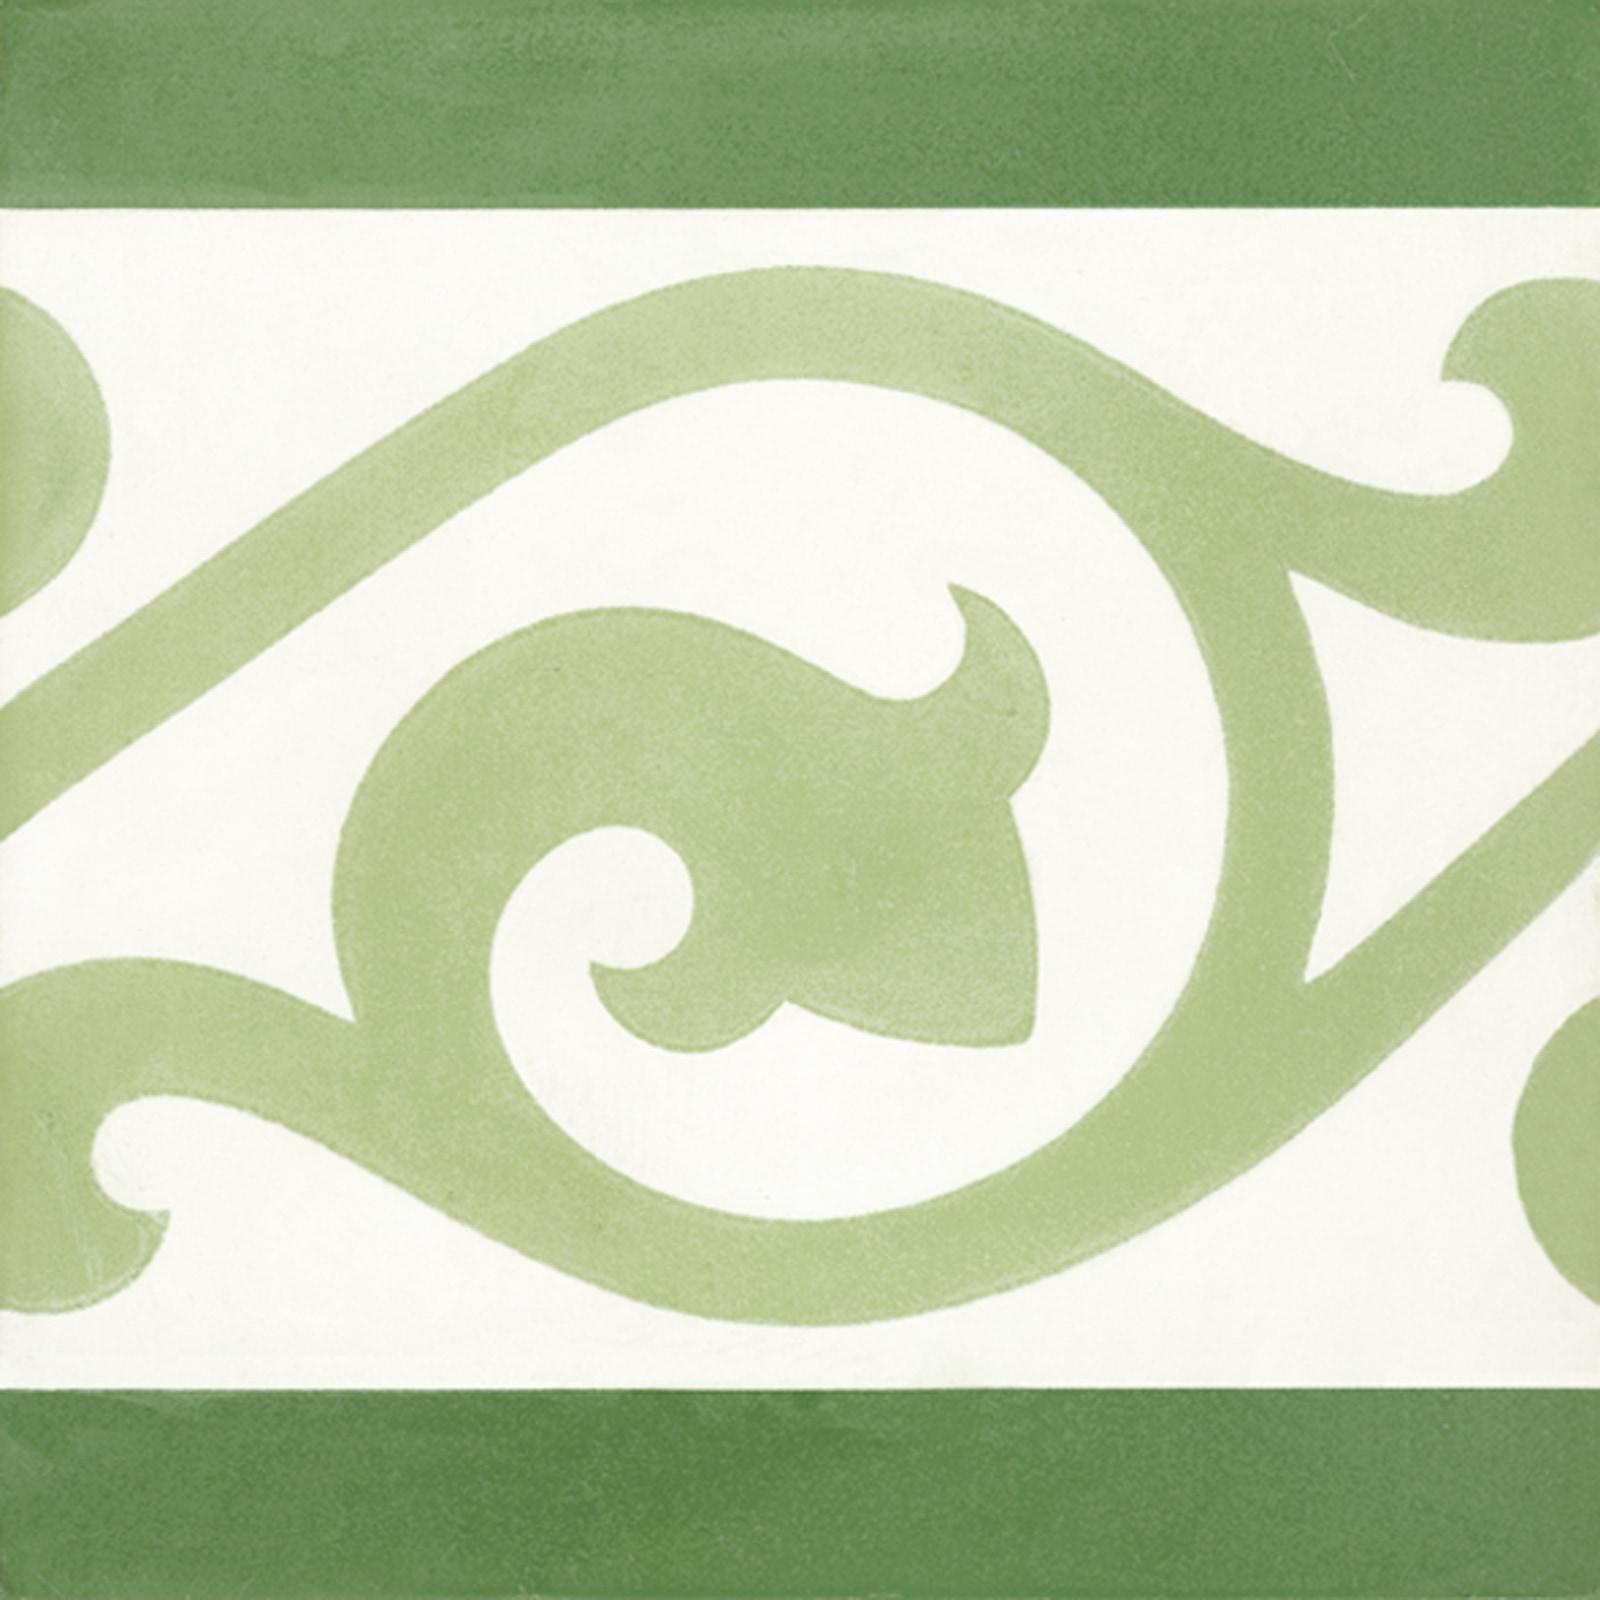 zementmosaikplatte-nummer-20521-via-gmbh | 30521